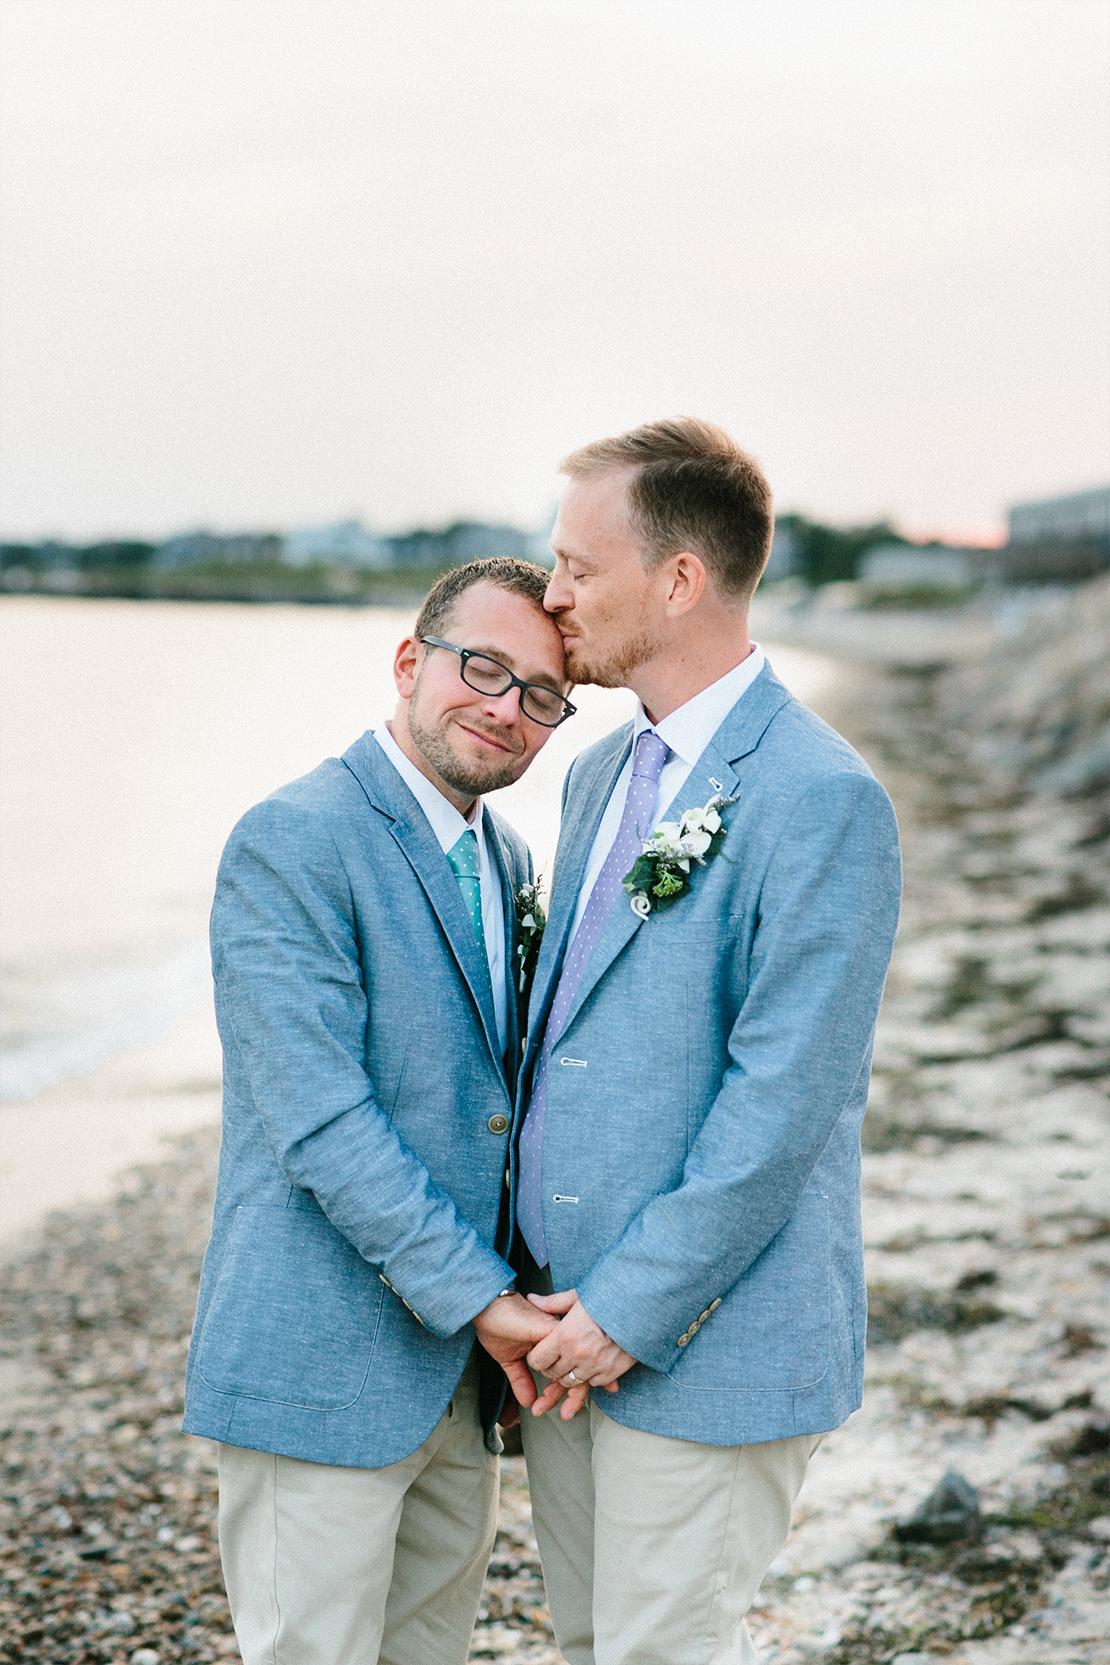 17_heidi_vail_falmouth_wedding_photography_falmouth_Cape_Cod_sweet_kiss